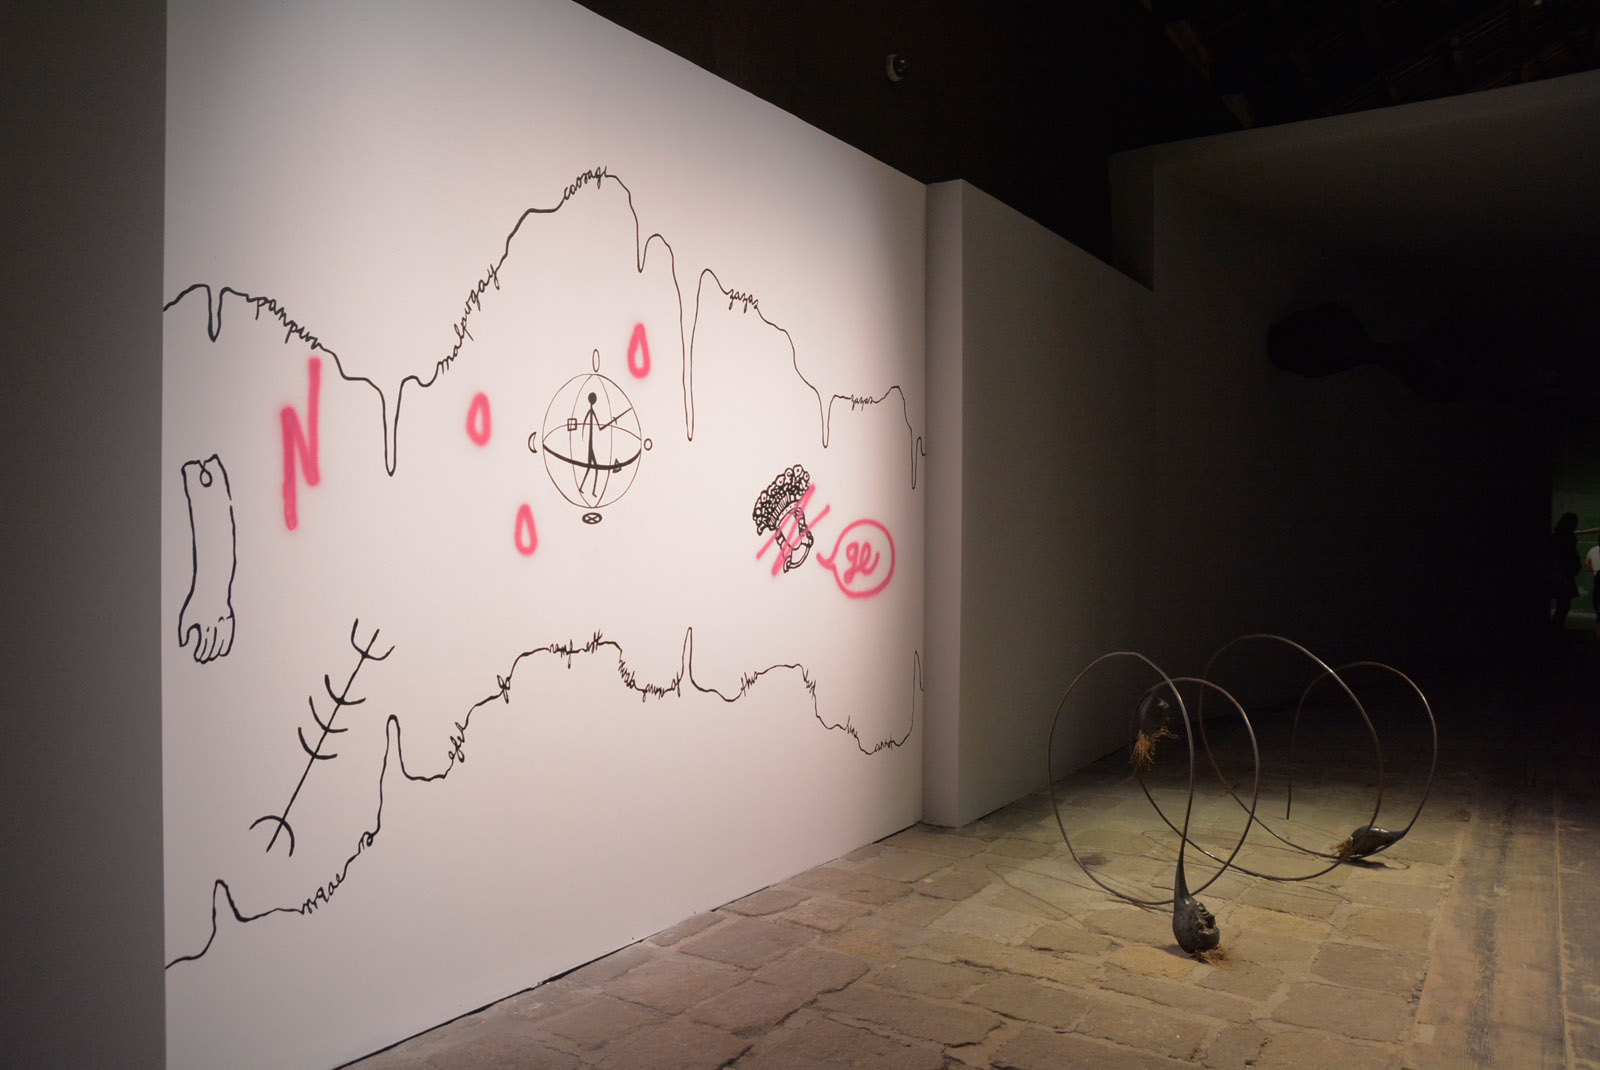 Chiara-Fumai-Padiglione-Italia-Biennale-Arte-2019